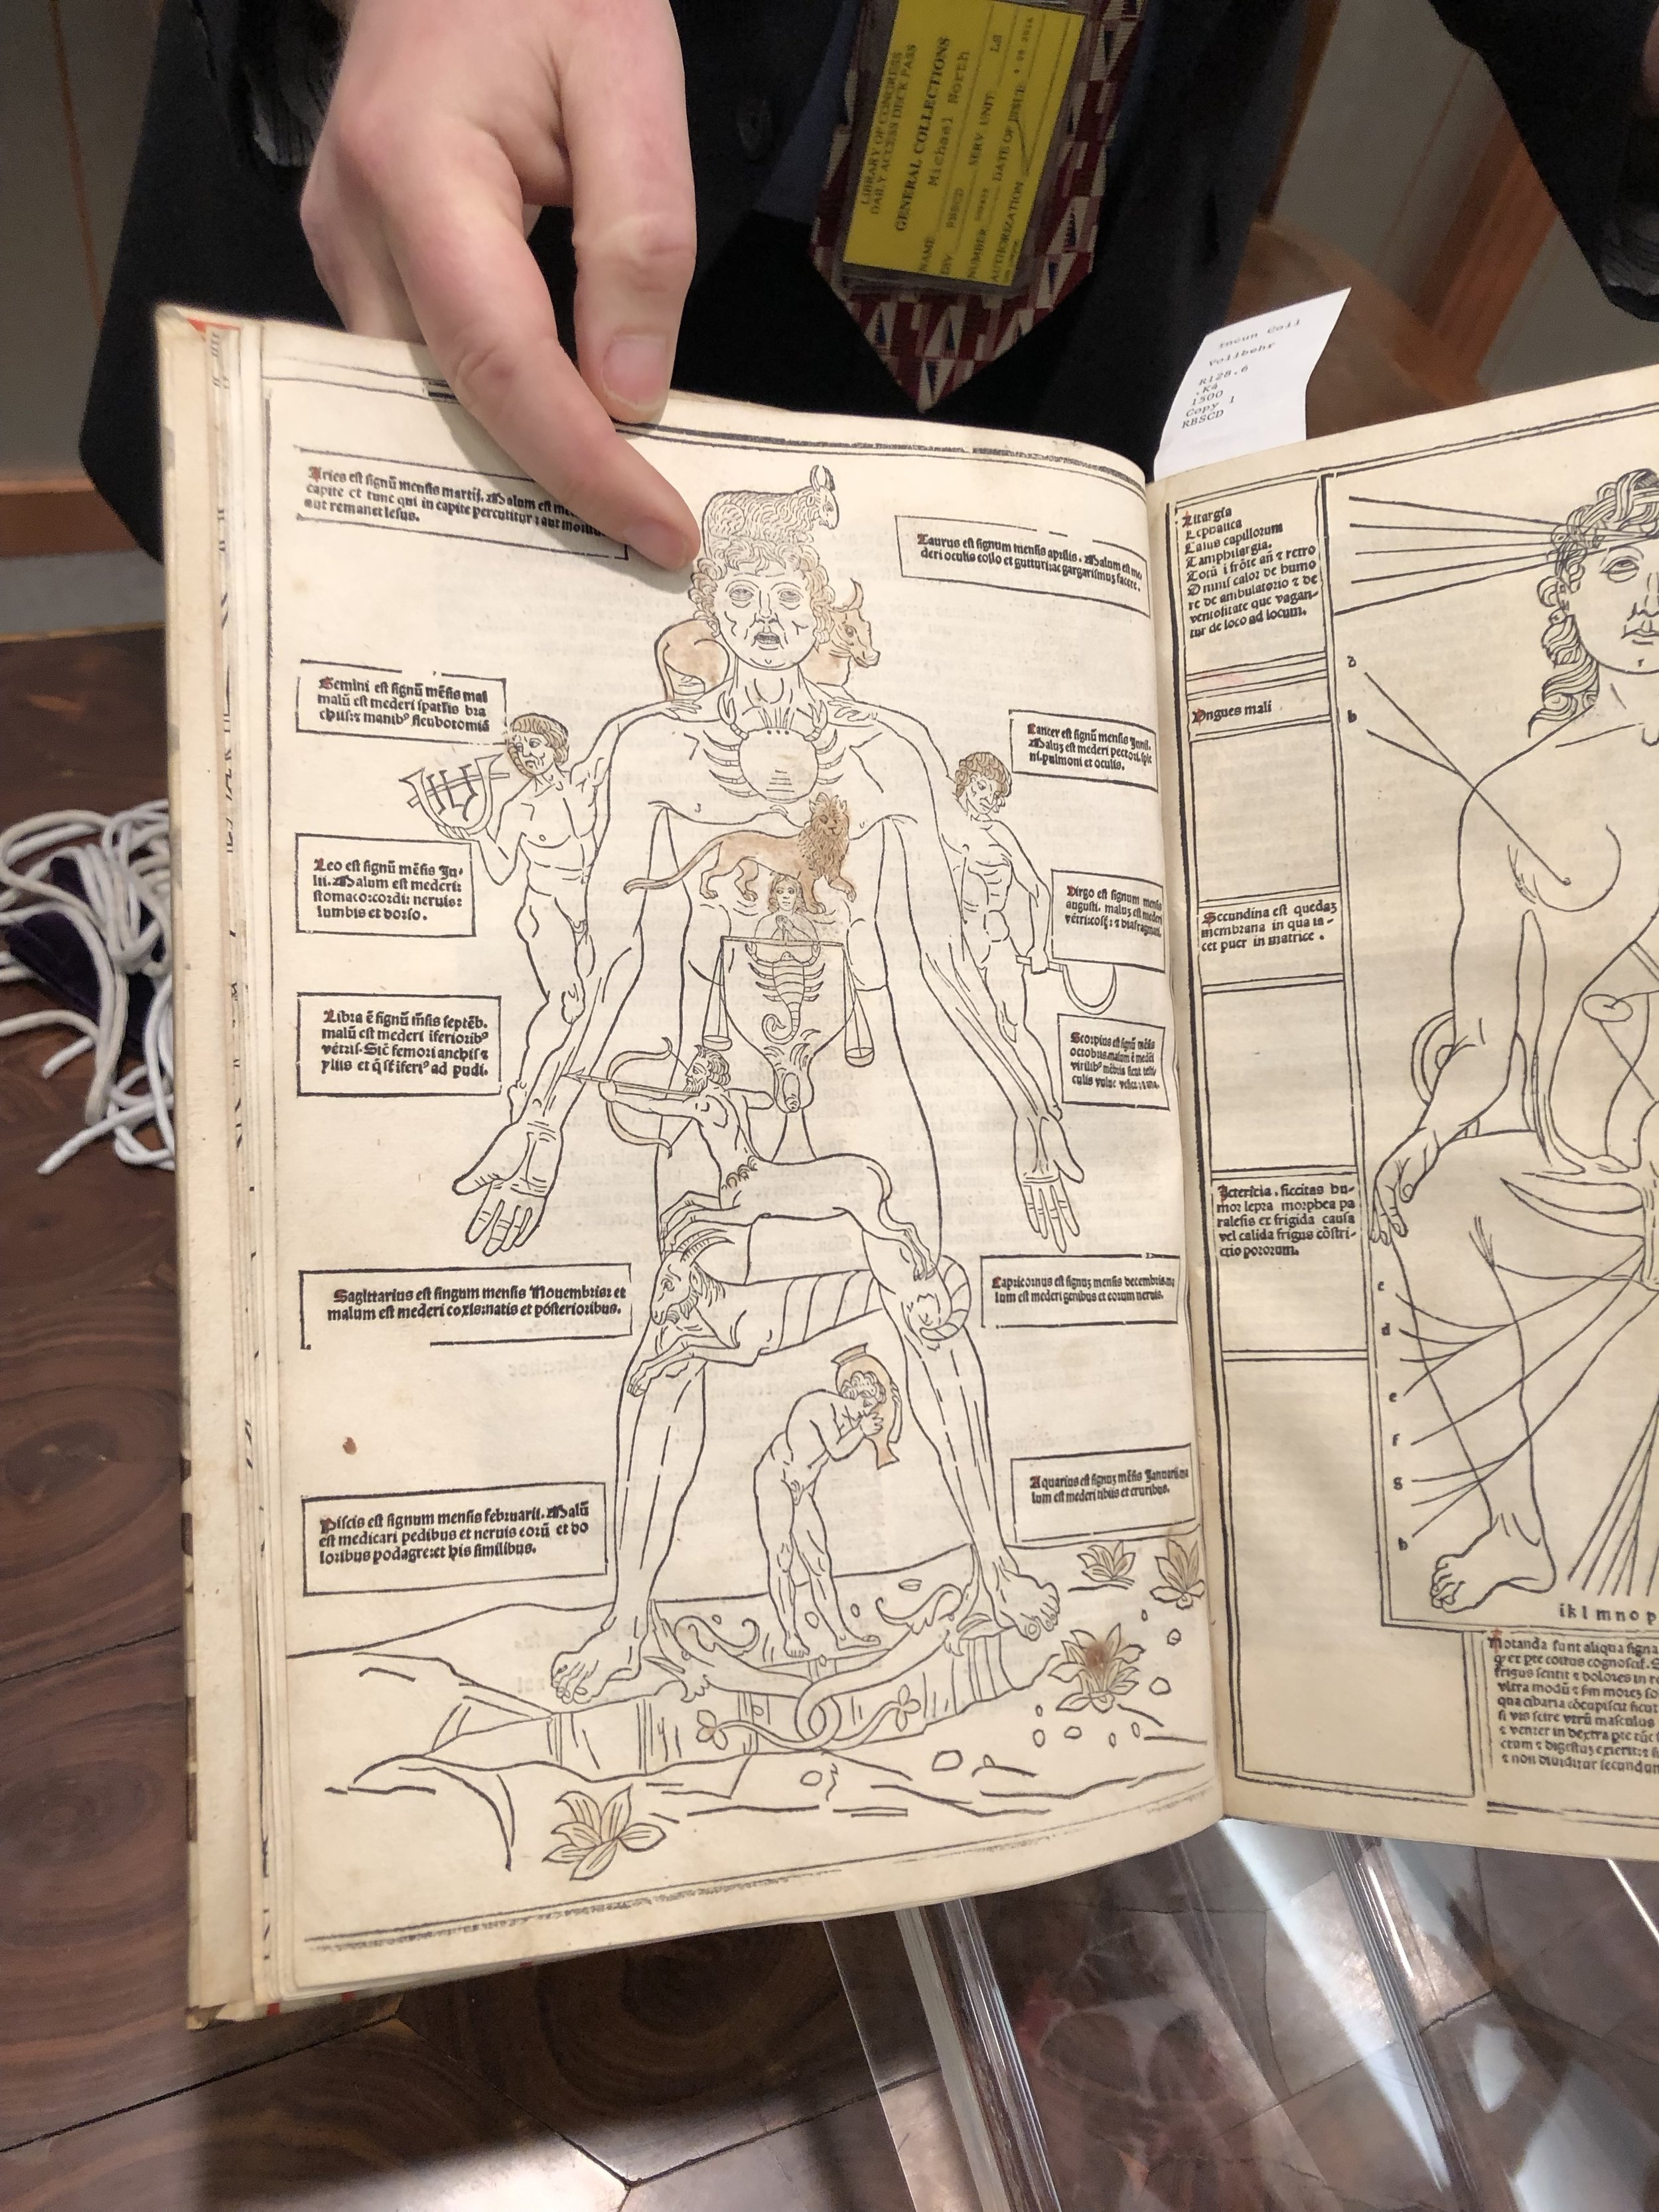 Astrological Medicine